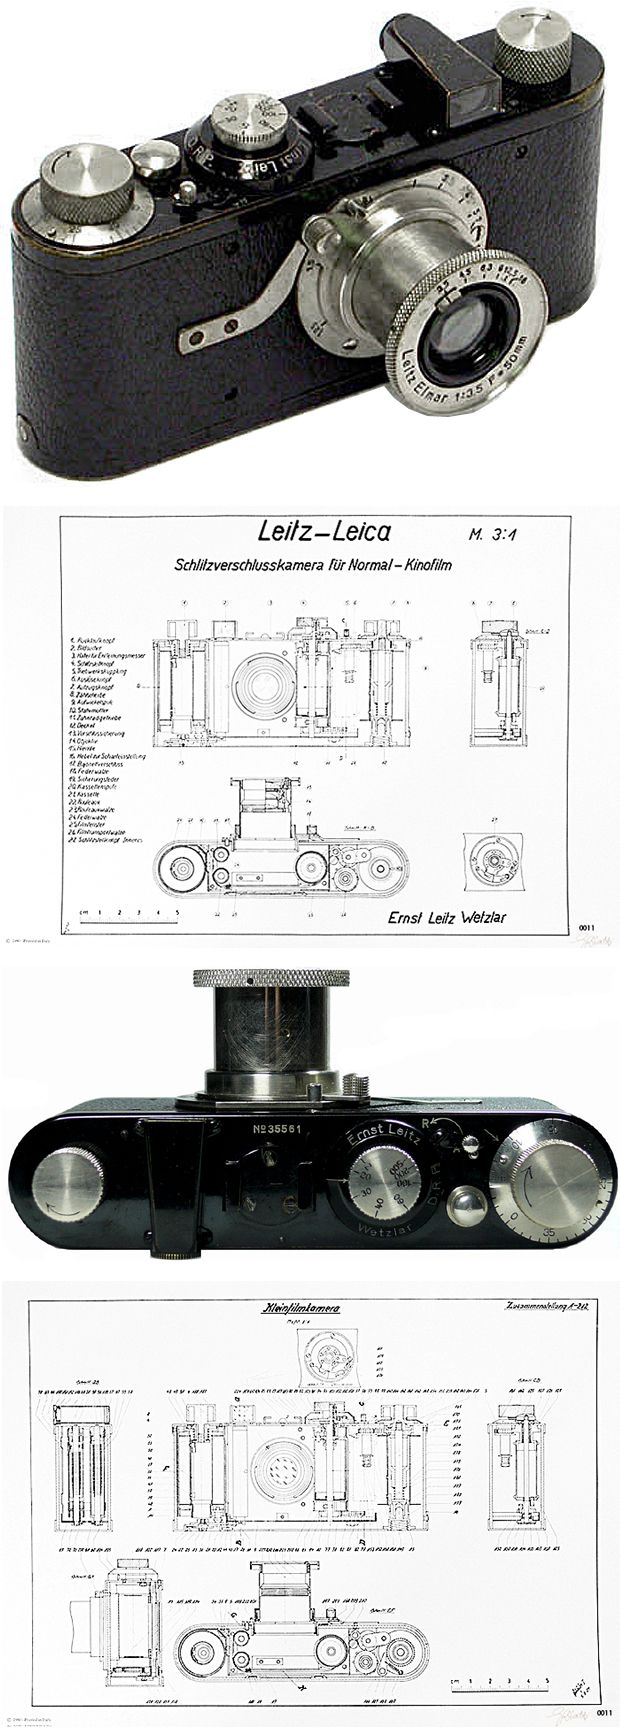 【Leica×Germany Brand】ライカ カメラの王者に君臨する 10 の美しい透視図と設計図